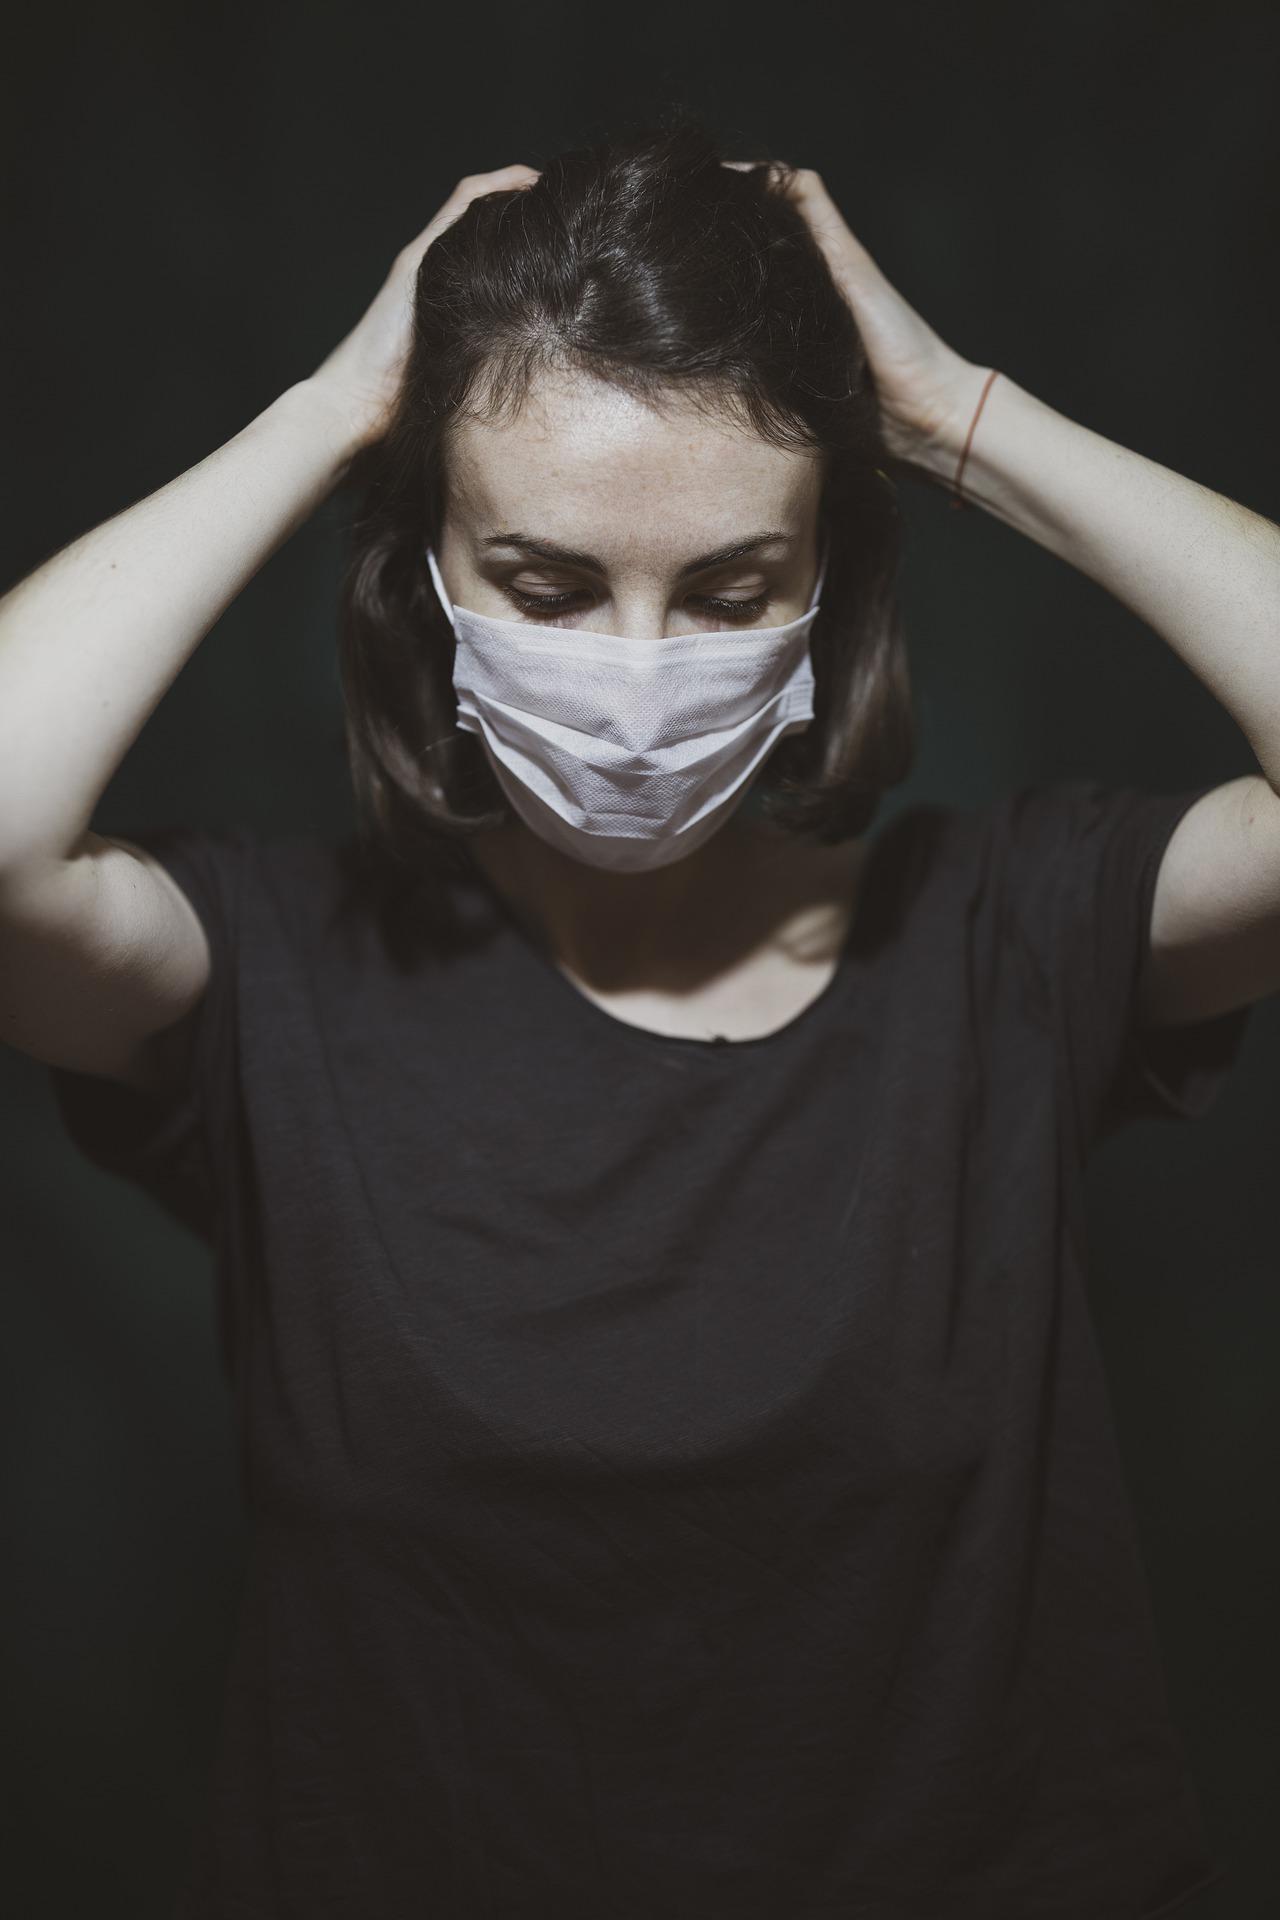 epidemic-5082507_1920.jpg